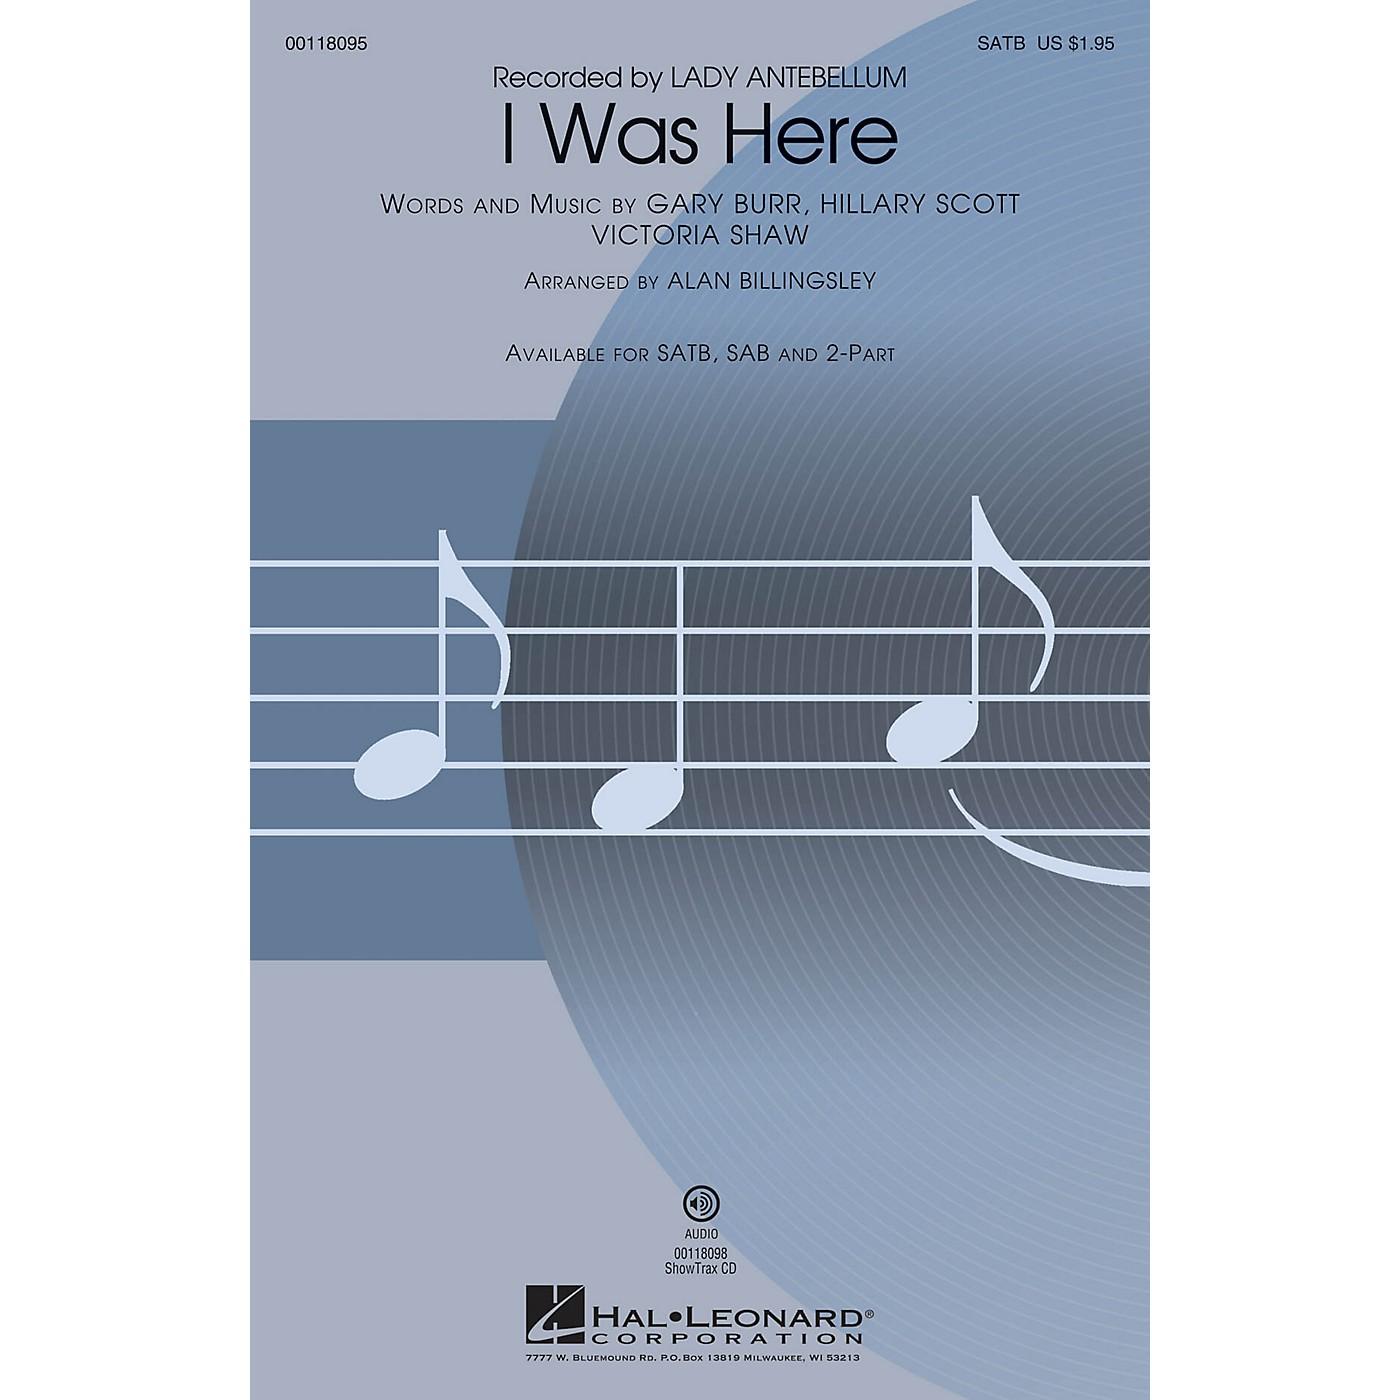 Hal Leonard I Was Here (SATB) SATB by Lady Antebellum arranged by Alan Billingsley thumbnail